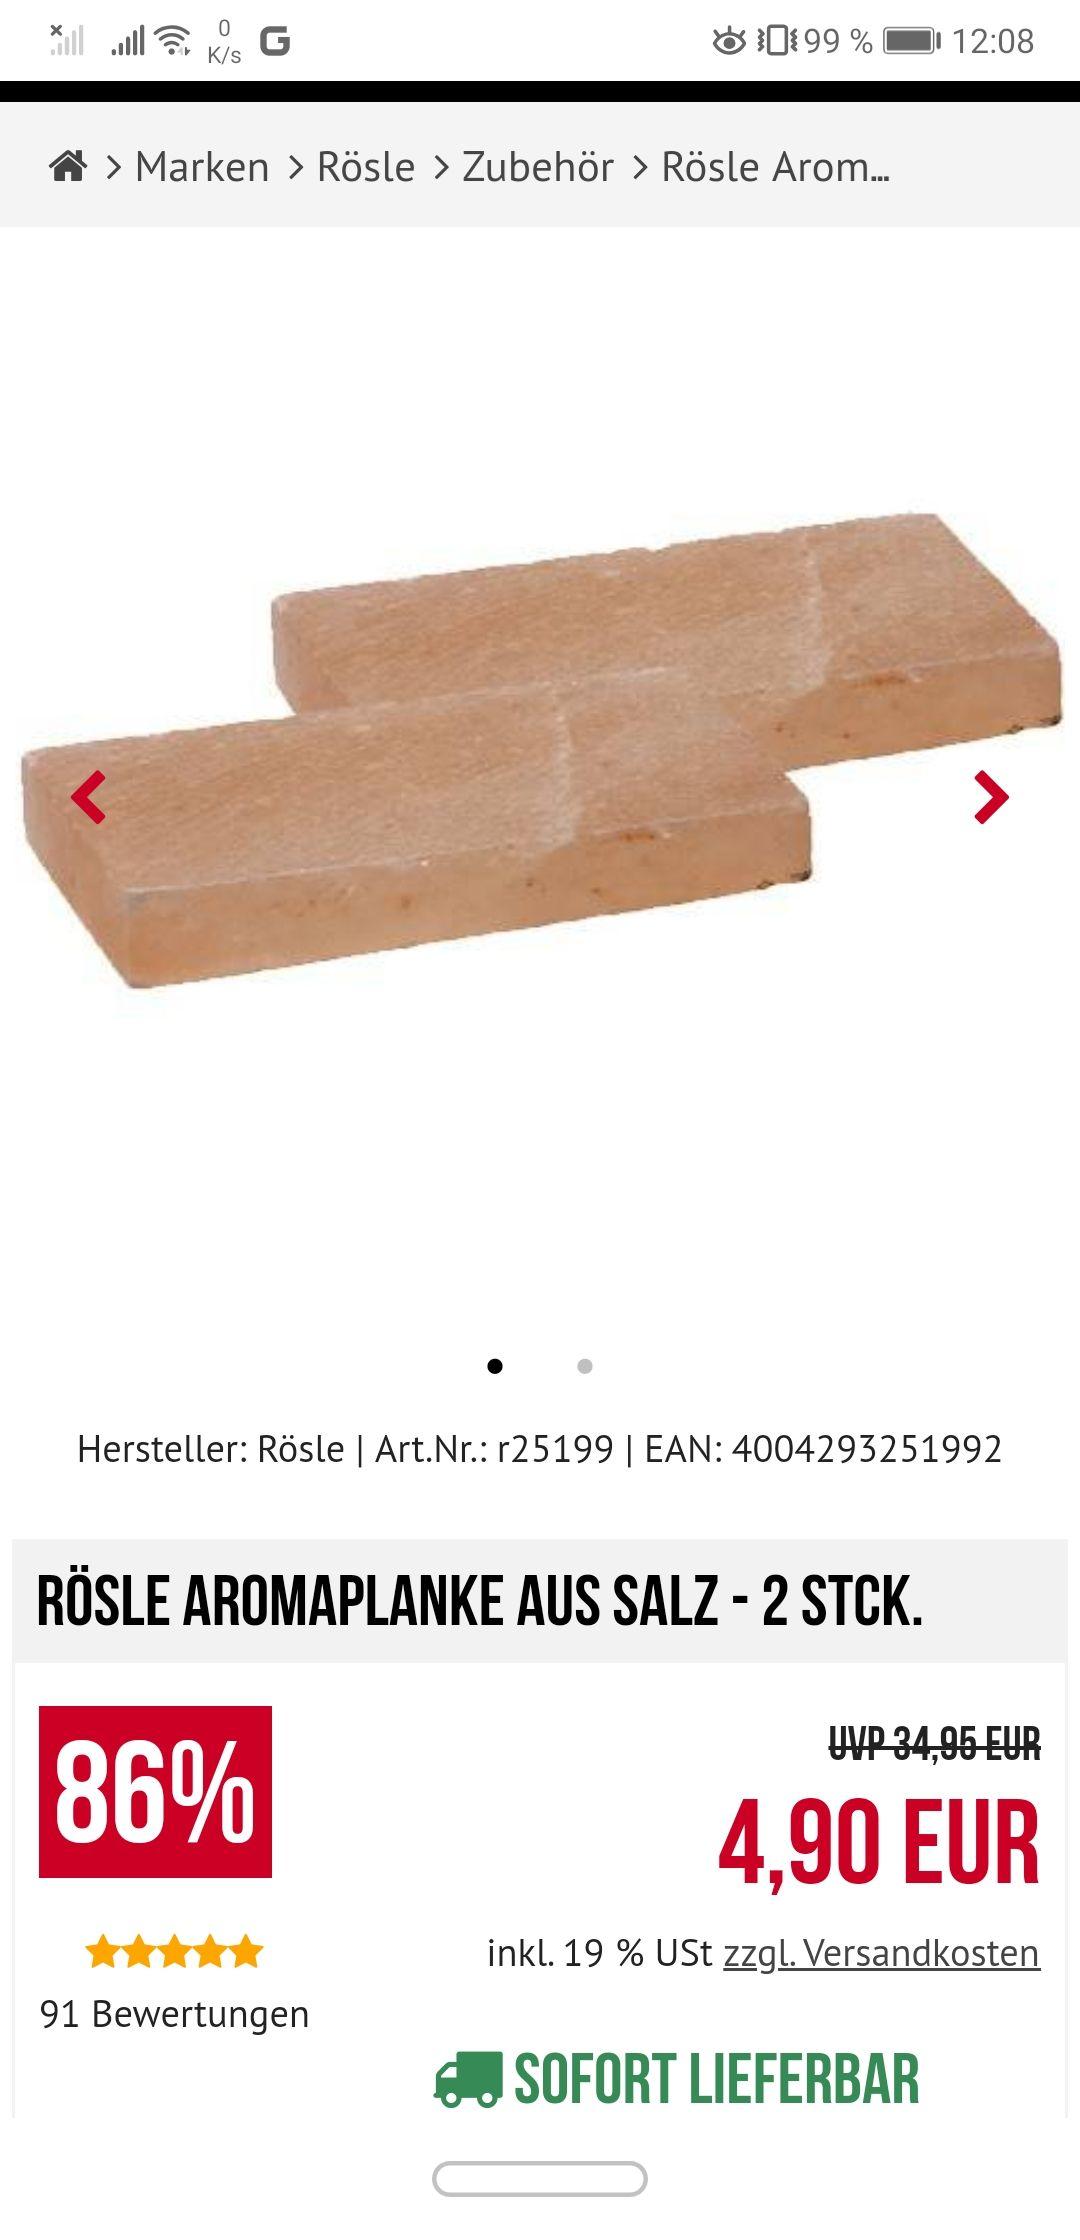 Rösle Aromaplanke aus Salz - 2 Stck.